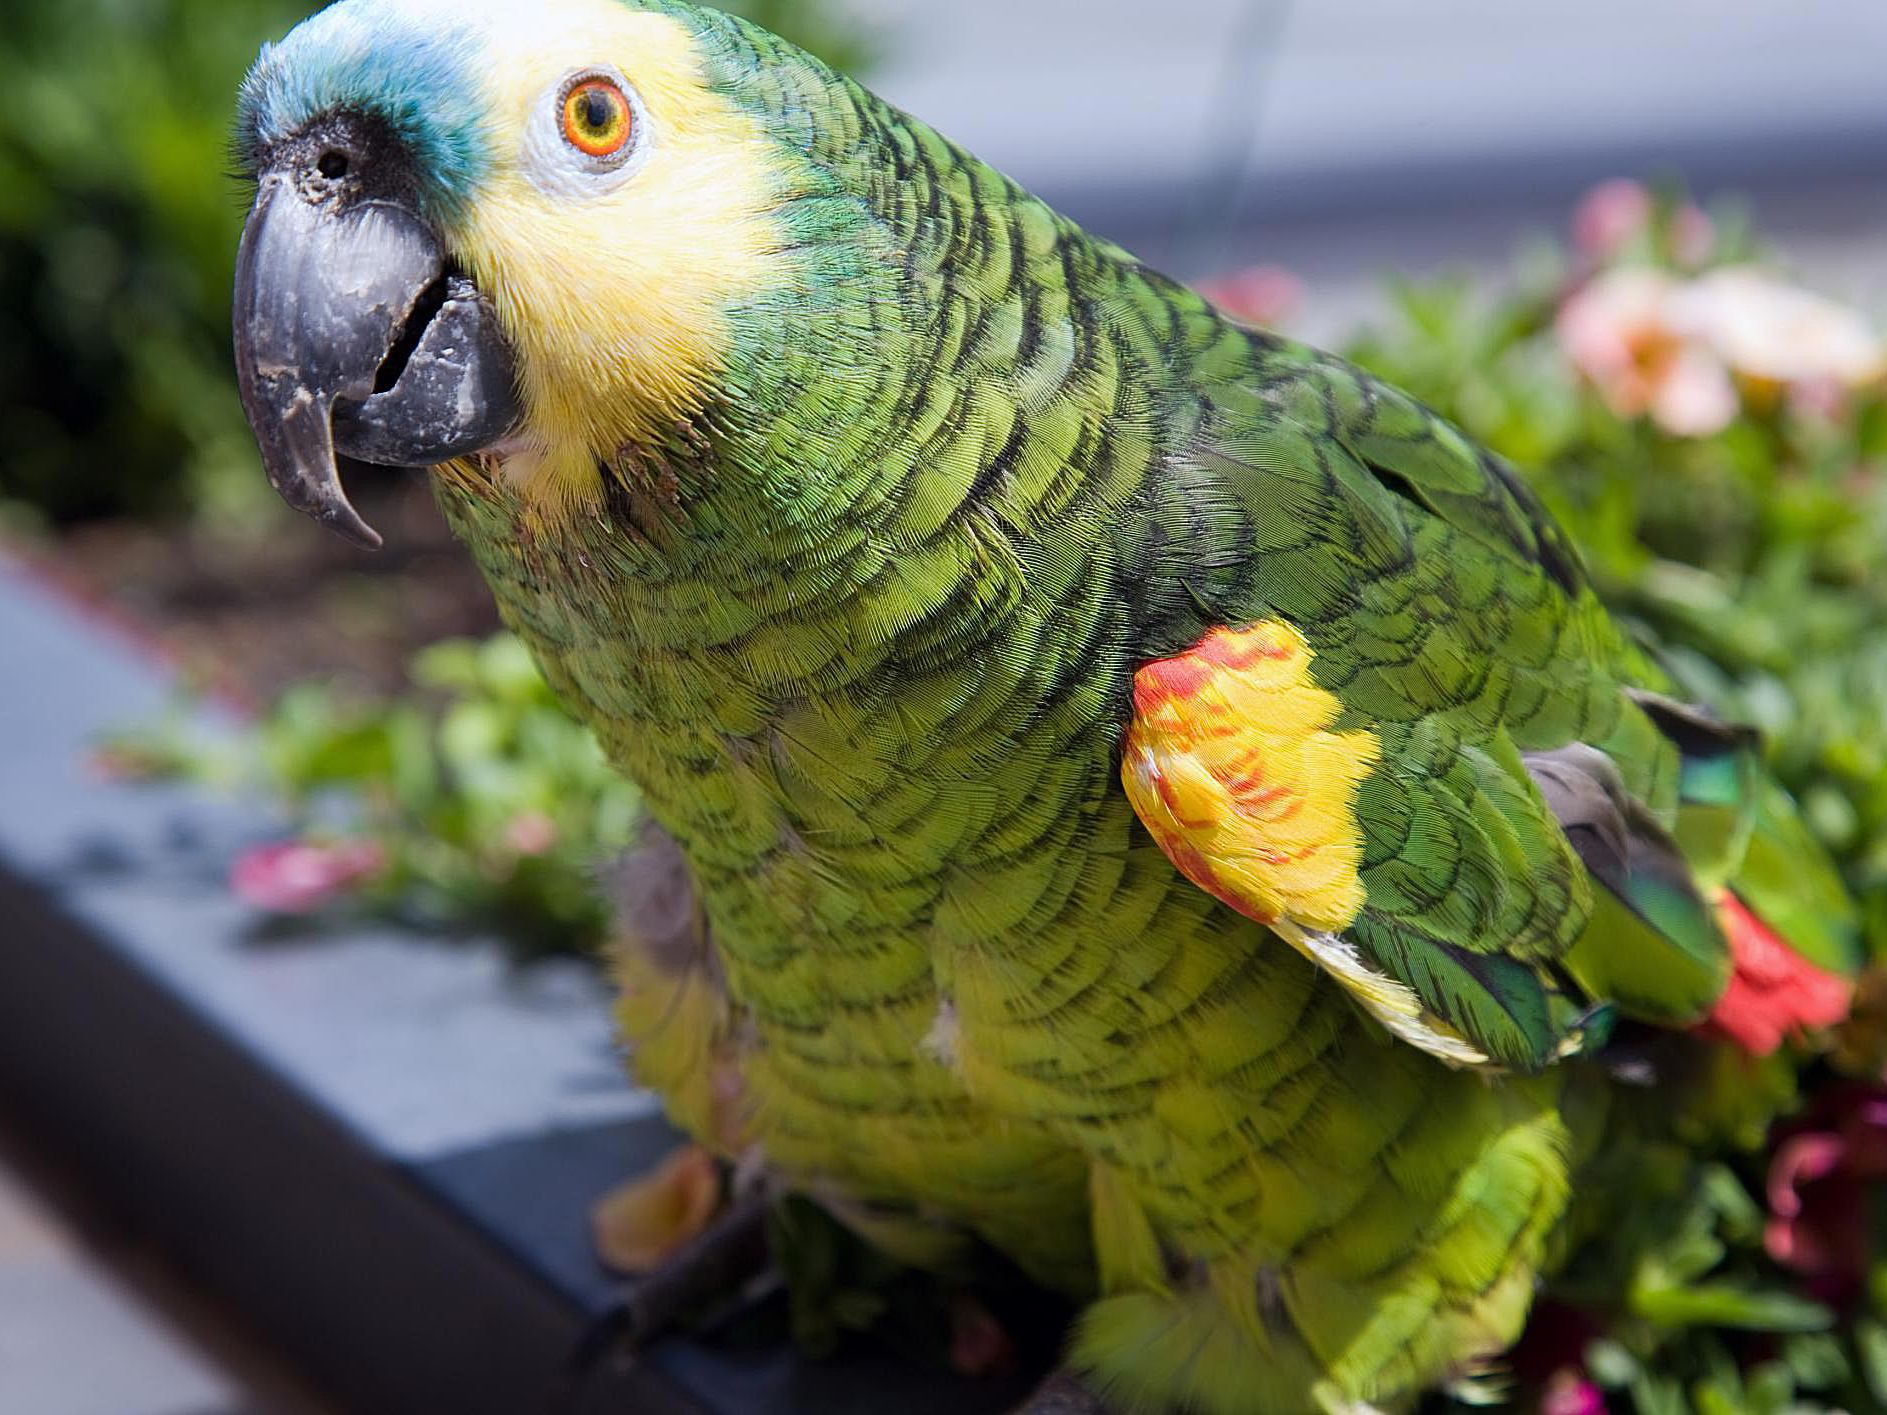 Interesting Amazon Parrot Facts